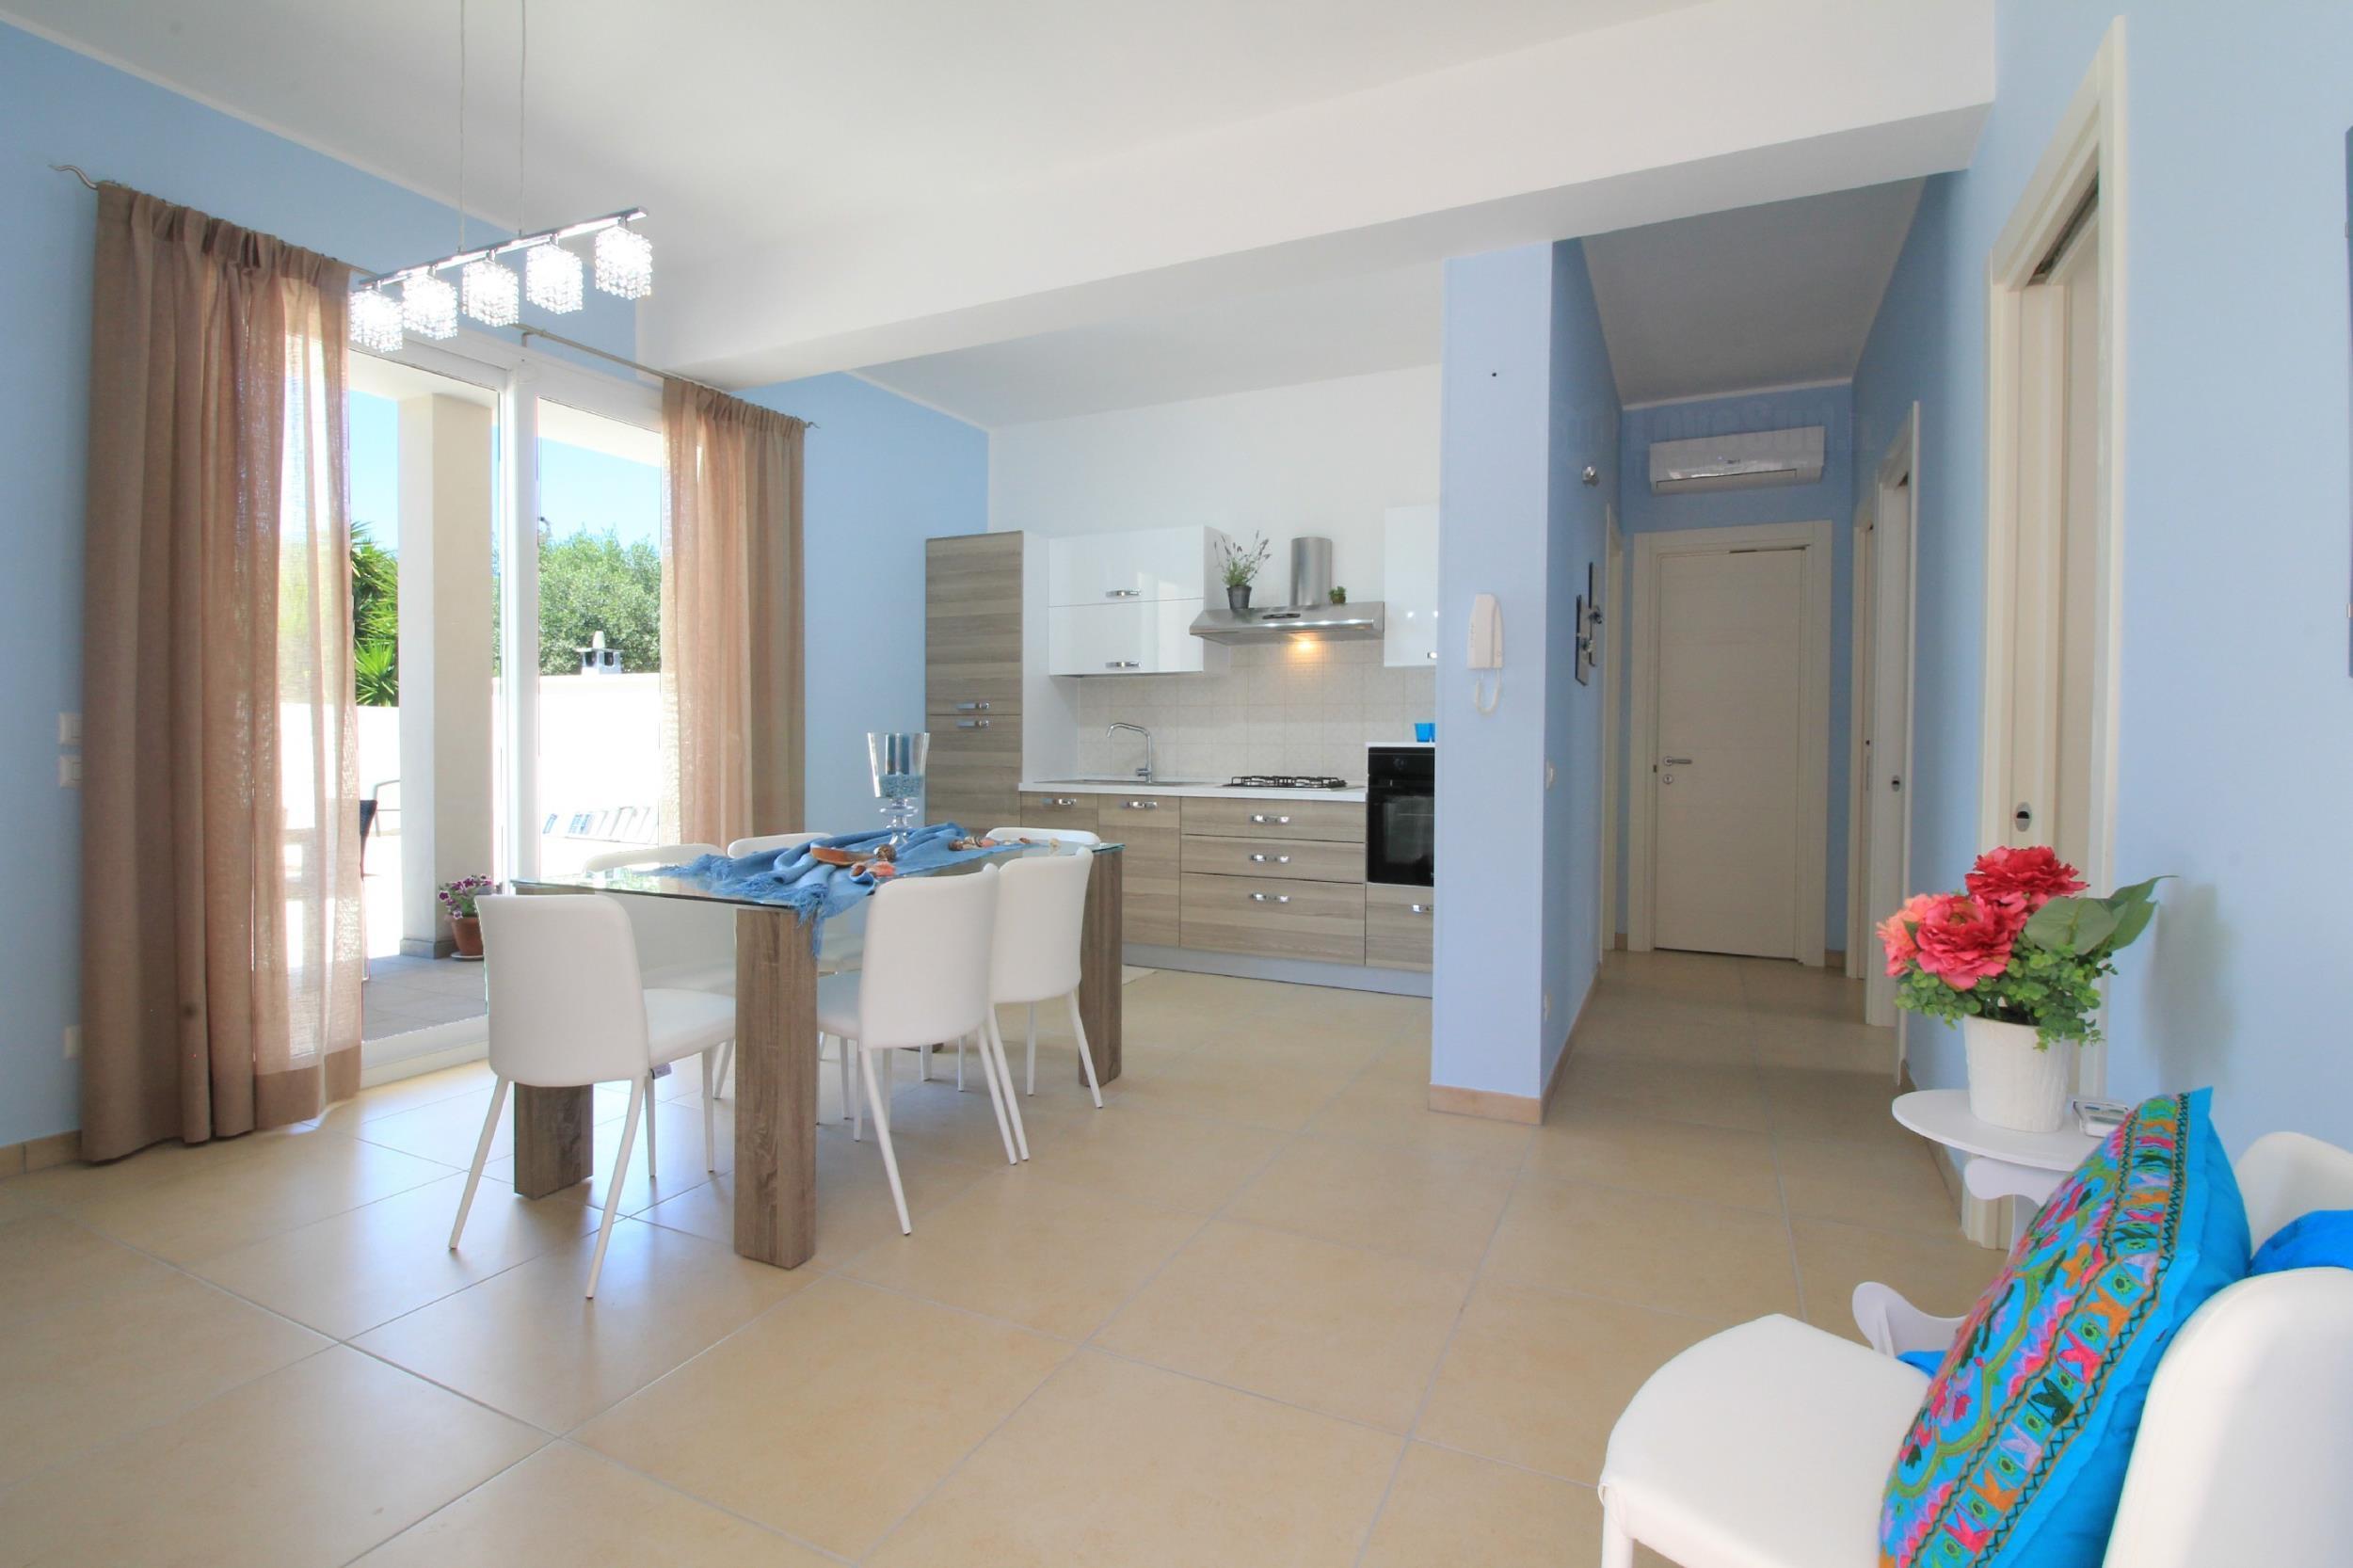 Apartment Elcisia luxe beach house photo 23457095